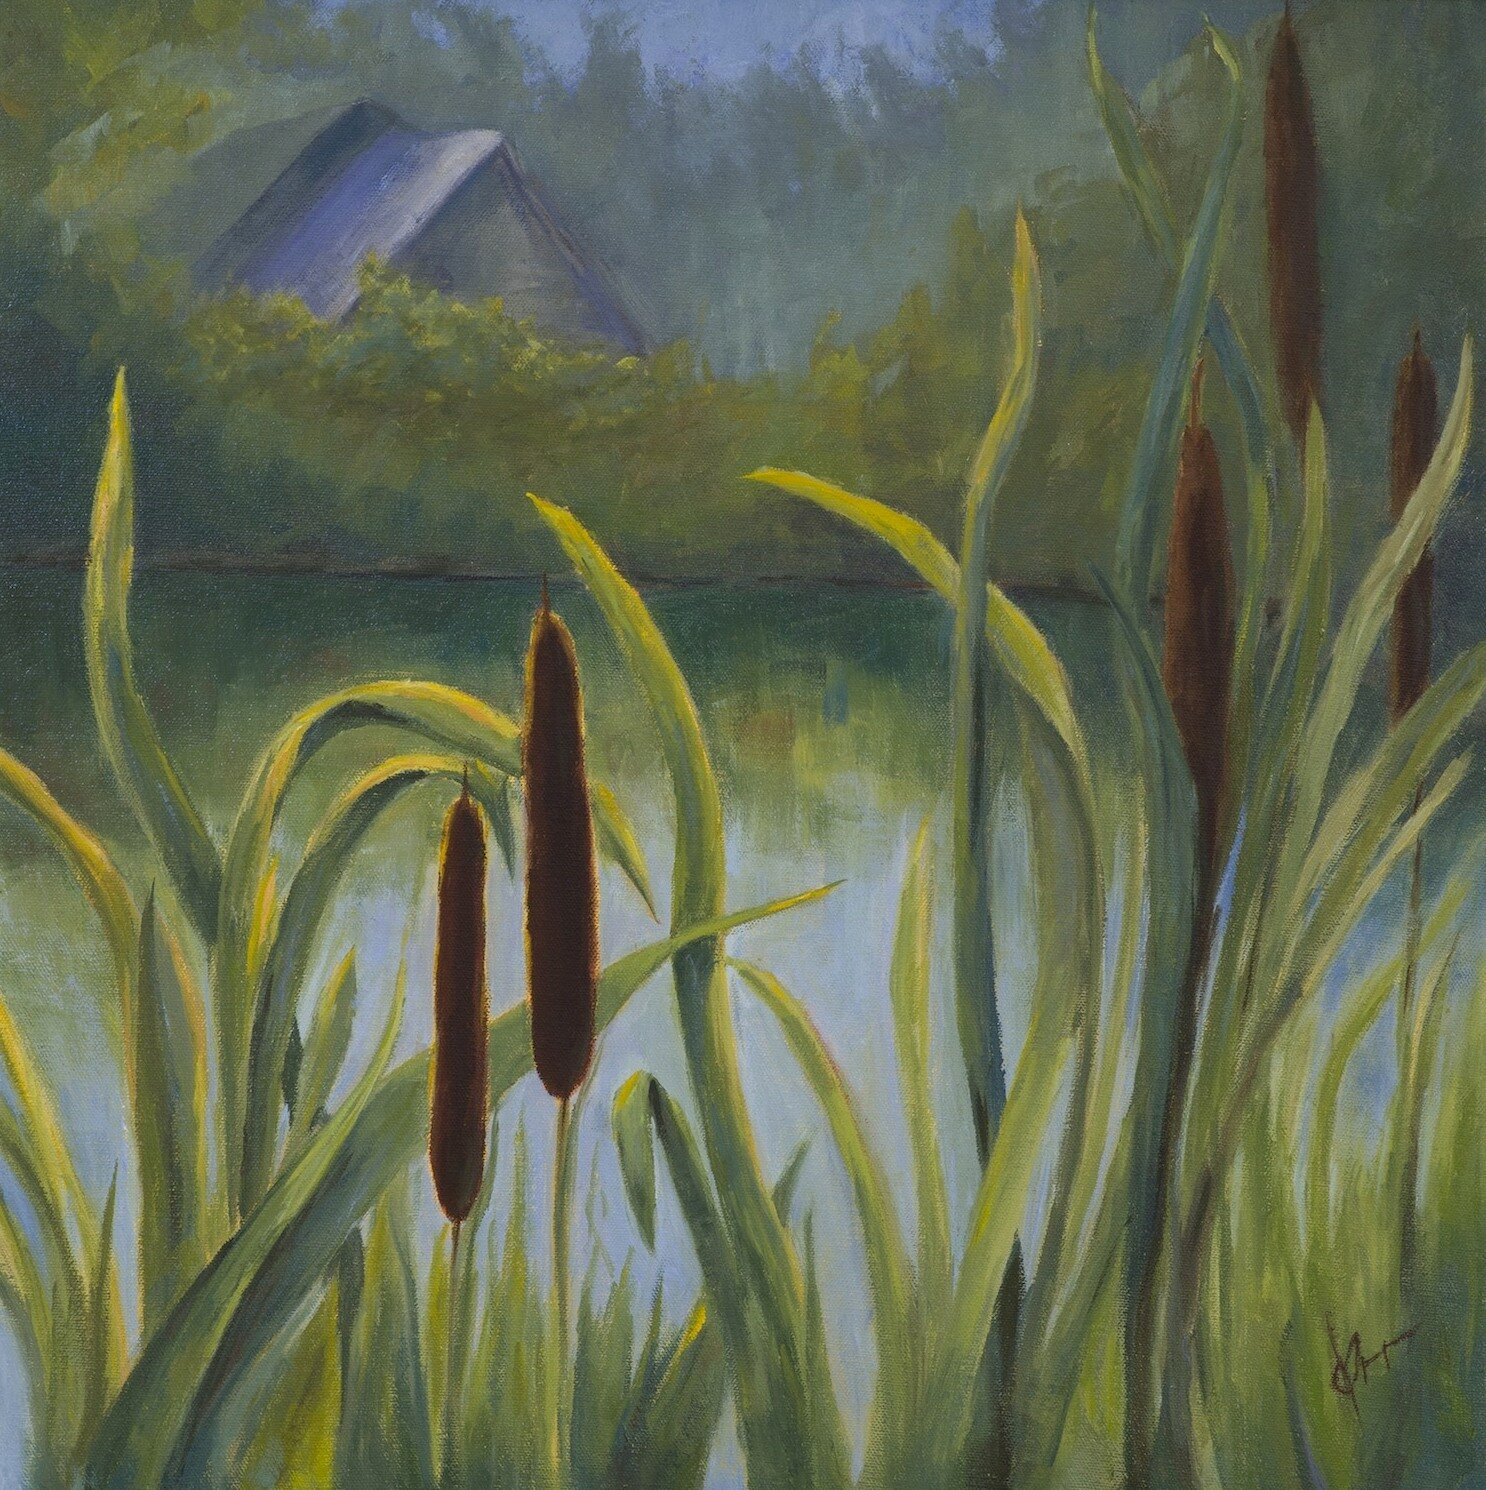 Darcy Orr, Landscape Painting, SVFAL-007.jpg